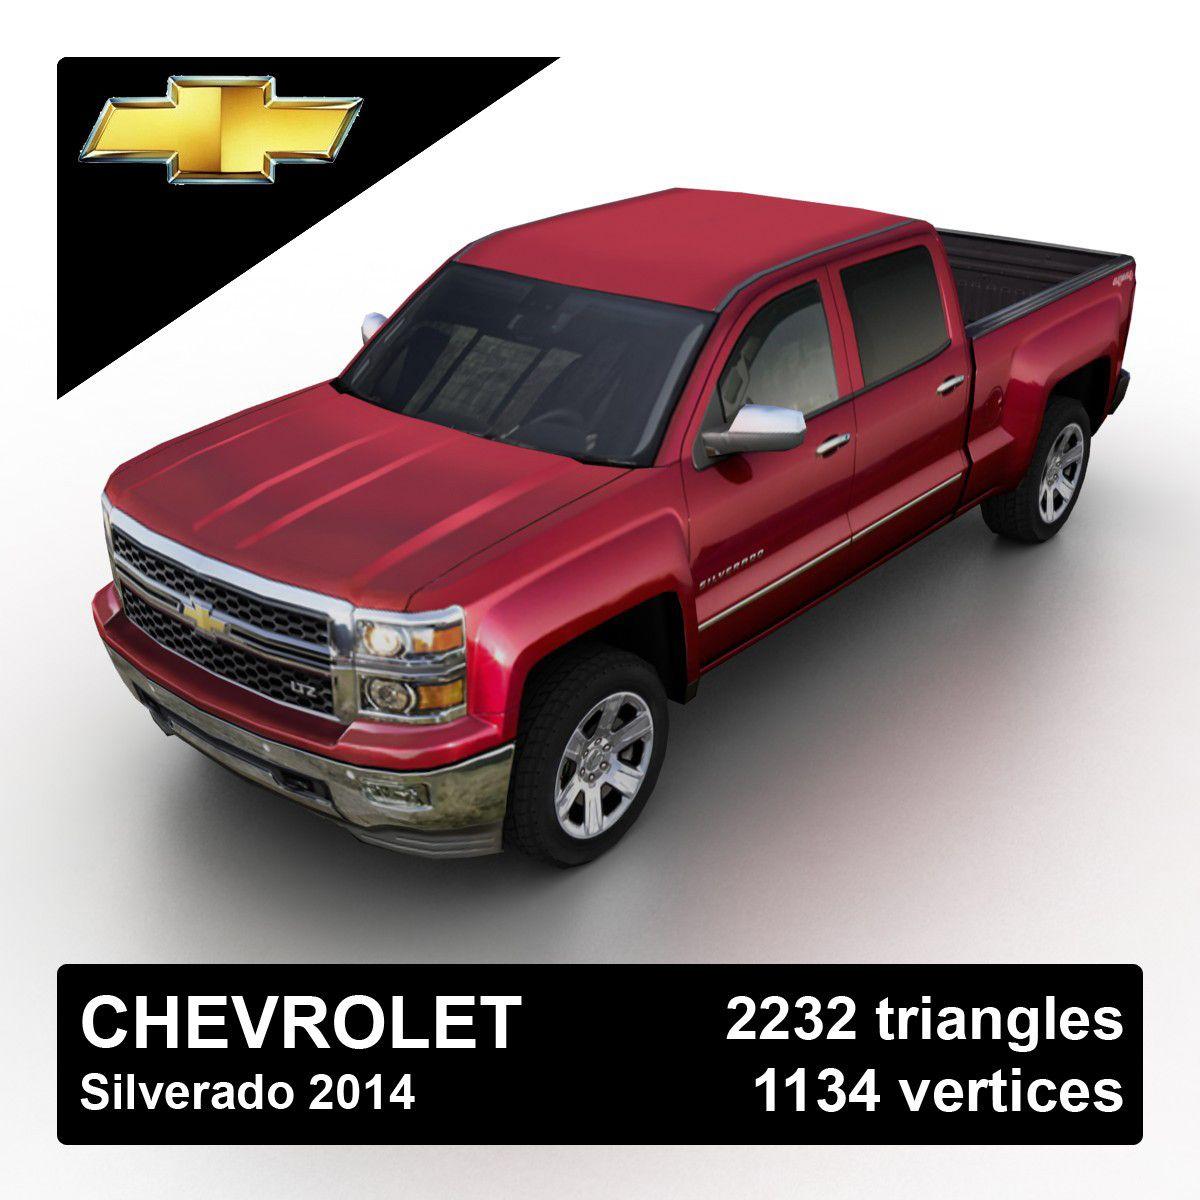 2014 Chevrolet Silverado Pickup Truck 3D 3Ds - 3D Model | 3D ...